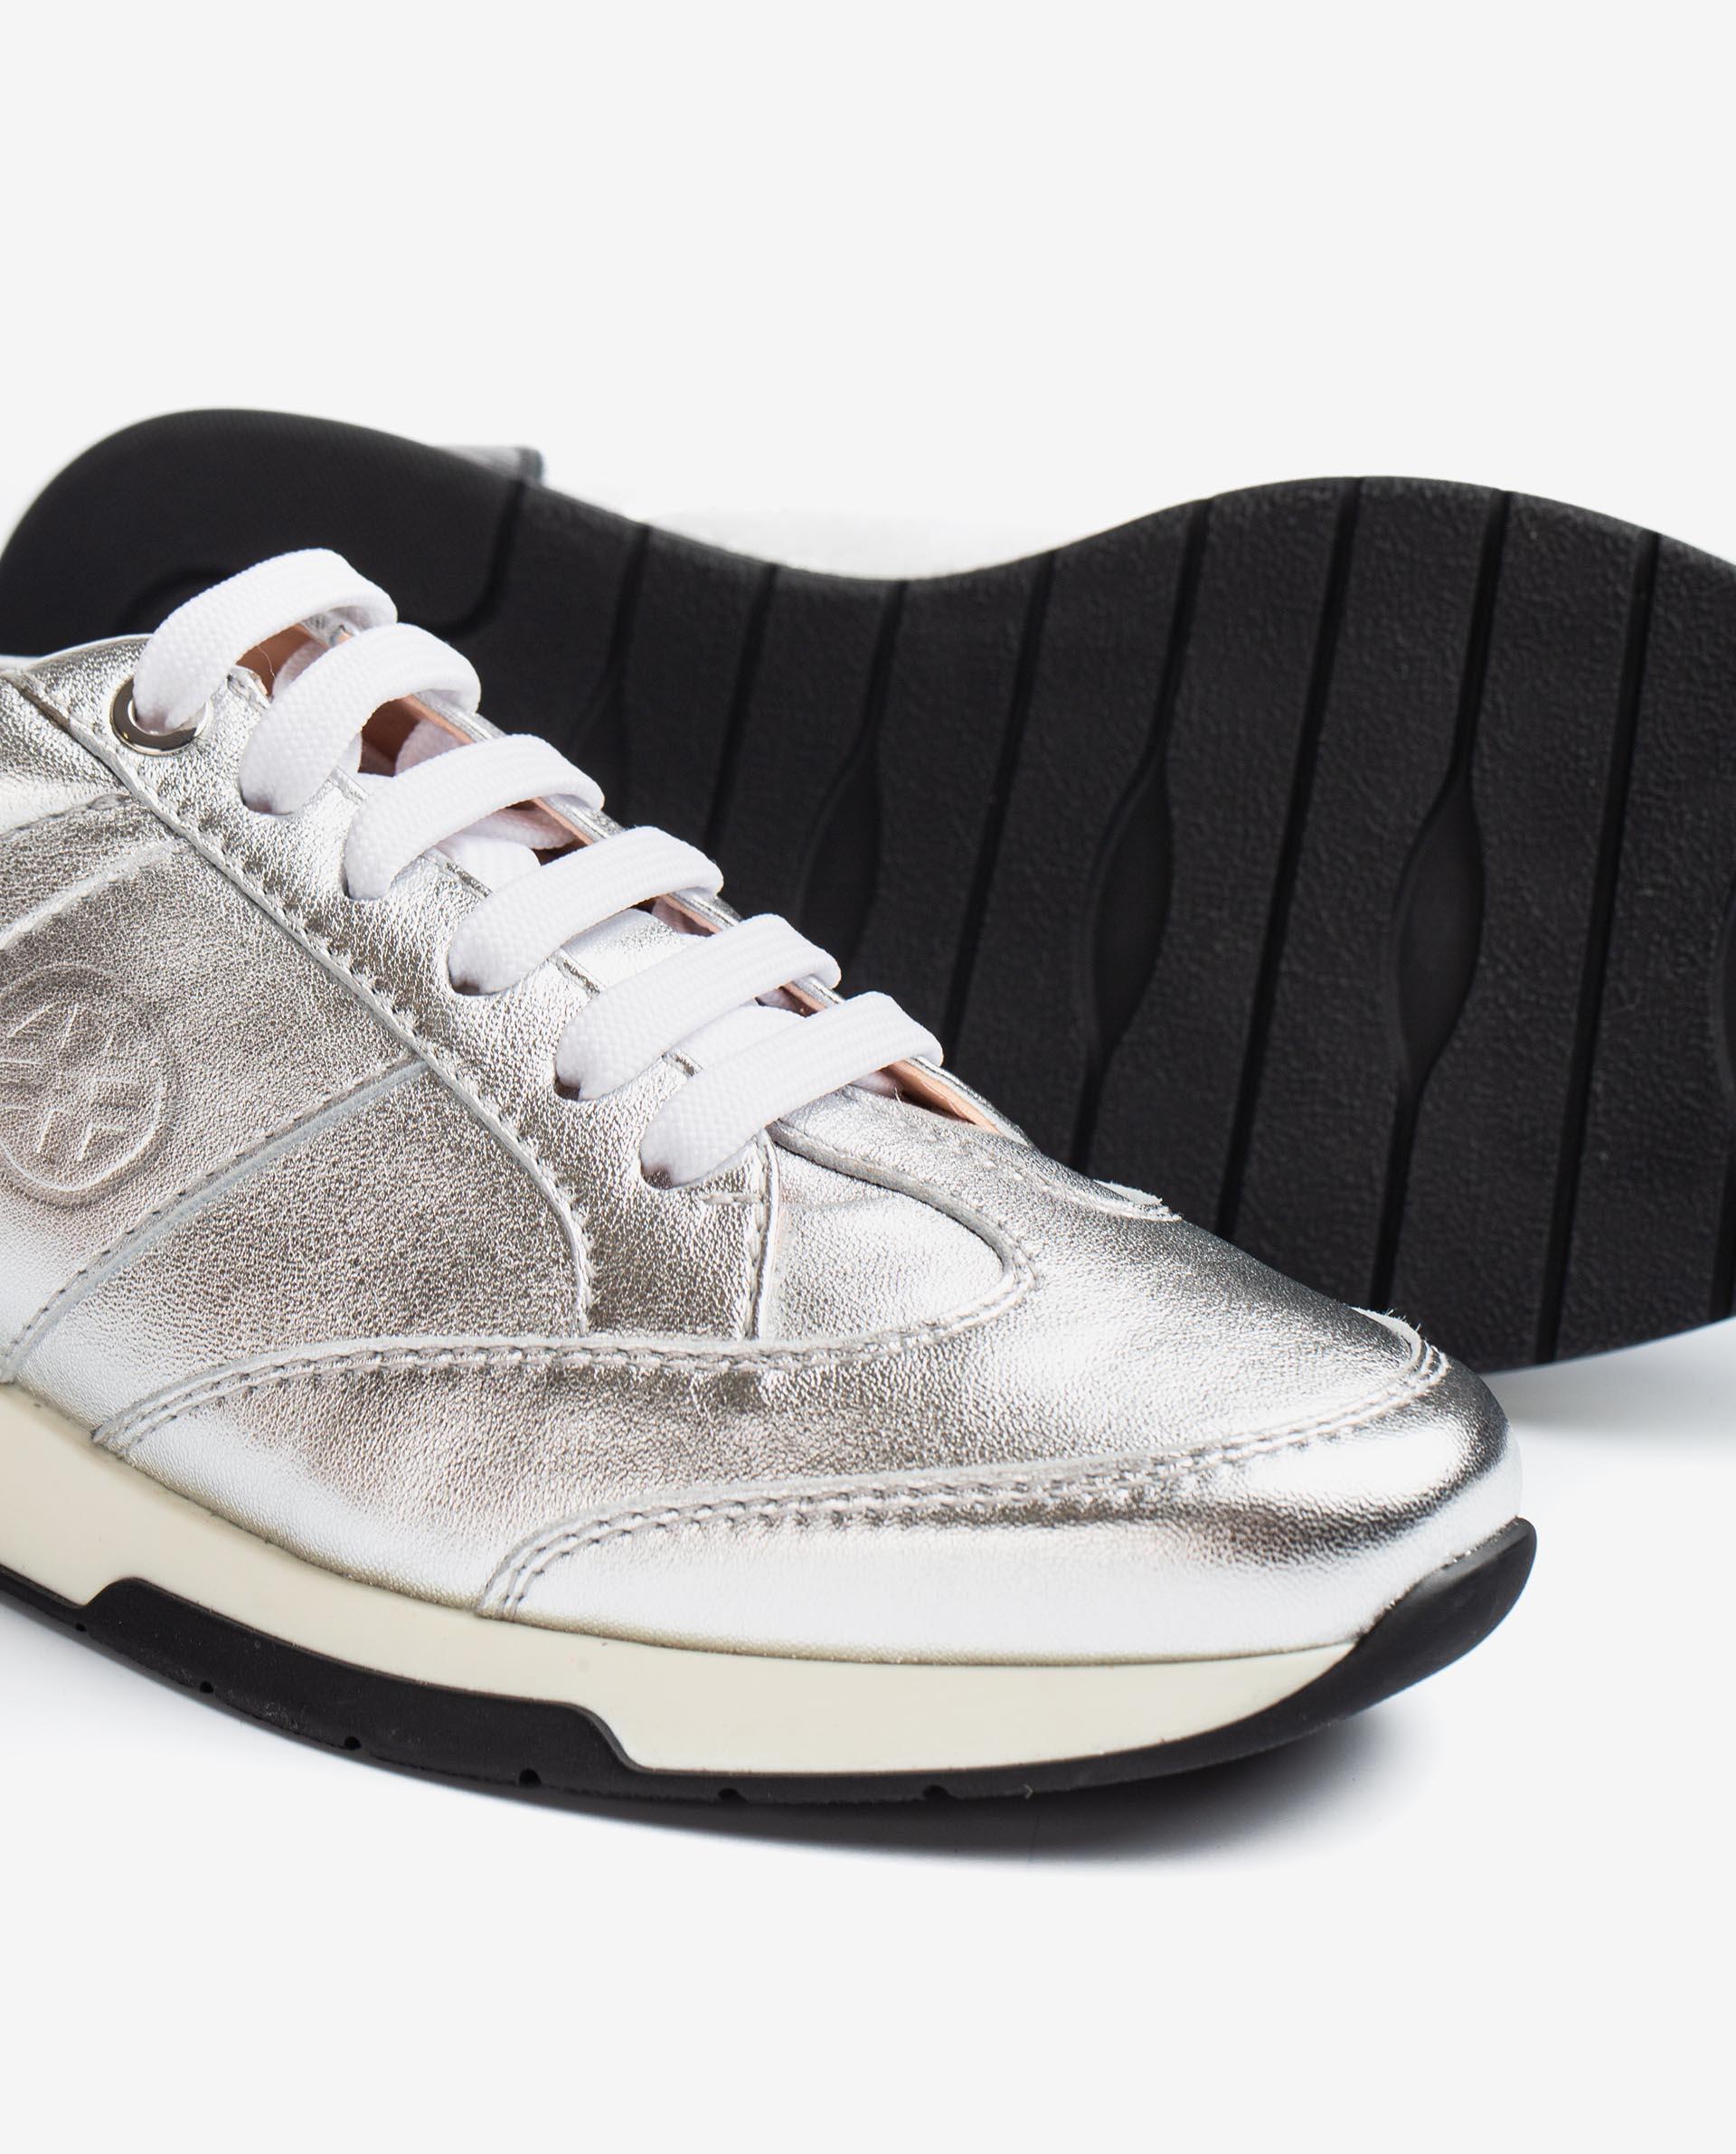 UNISA Ledersneaker mit Snake-Print FALCONI_21_LMT 5